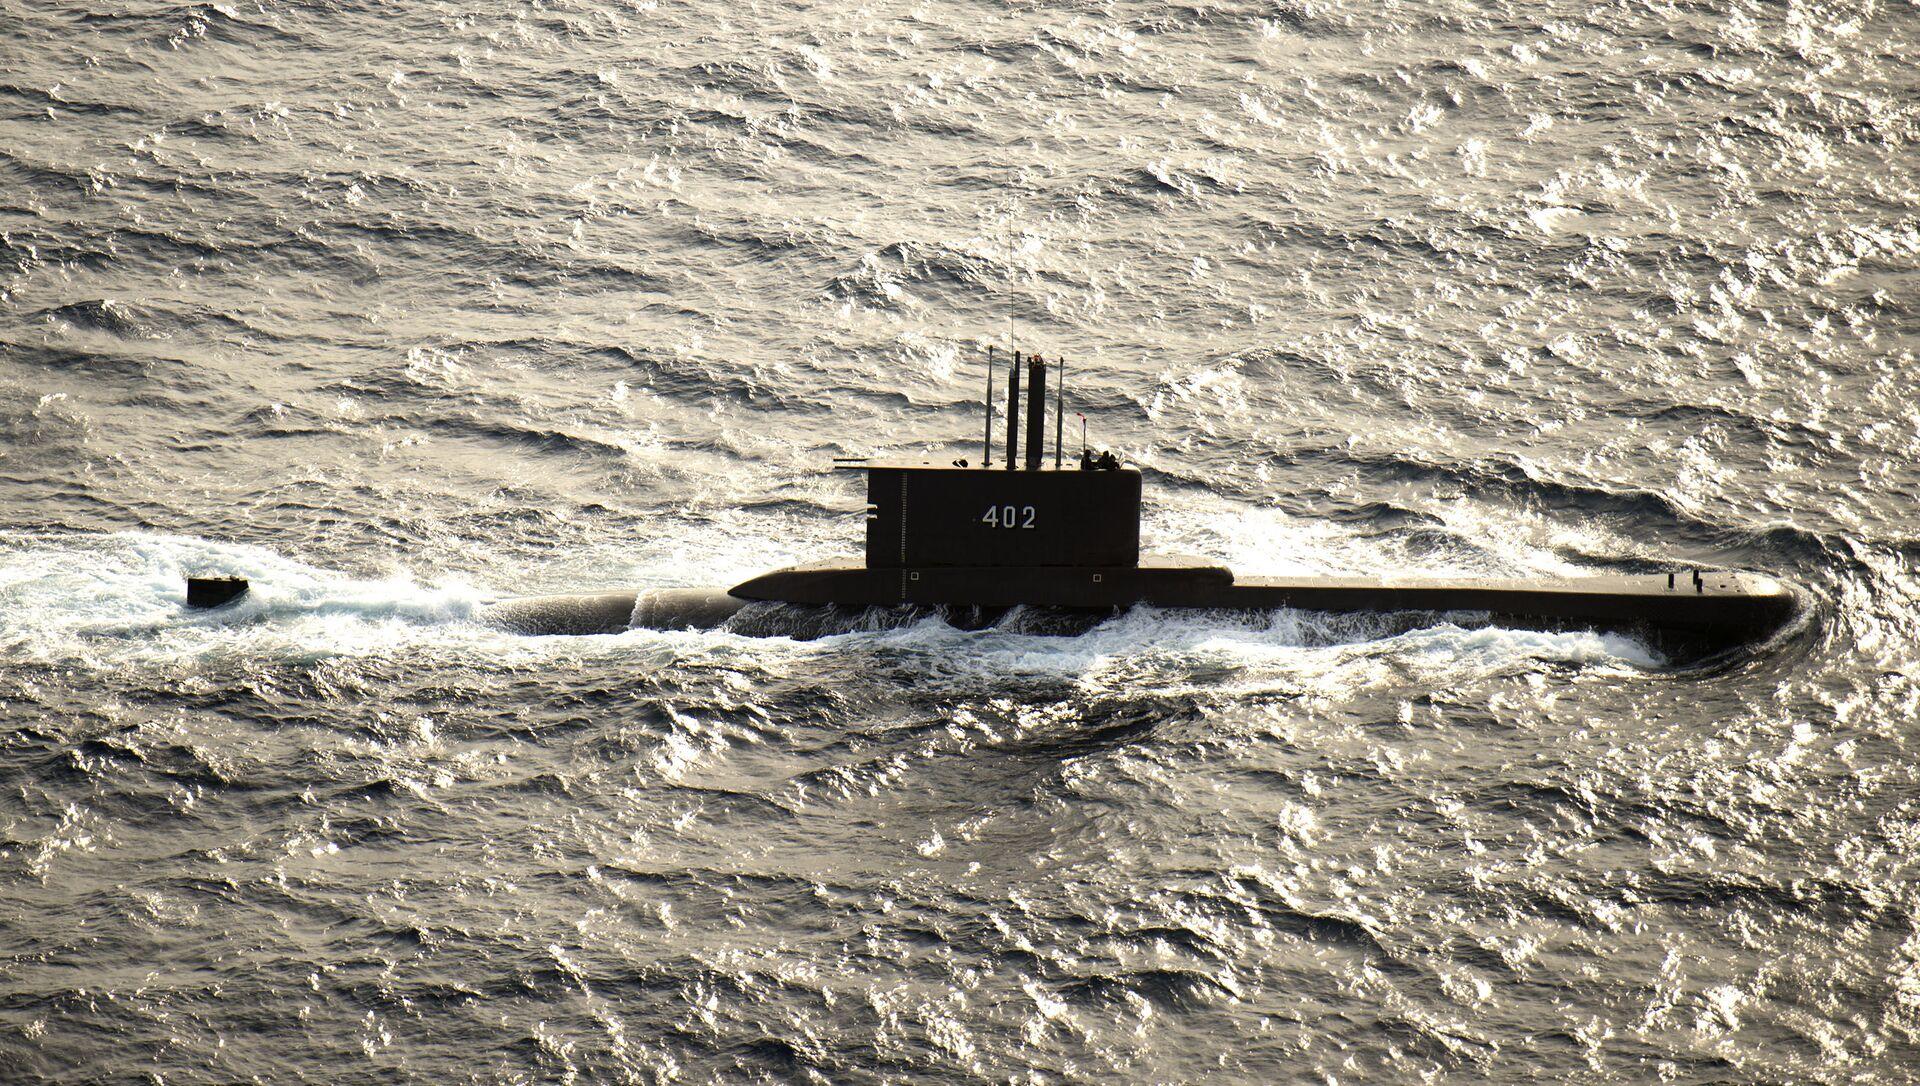 Il sottomarino indonesiano KRI Nanggala 402 - Sputnik Italia, 1920, 21.04.2021